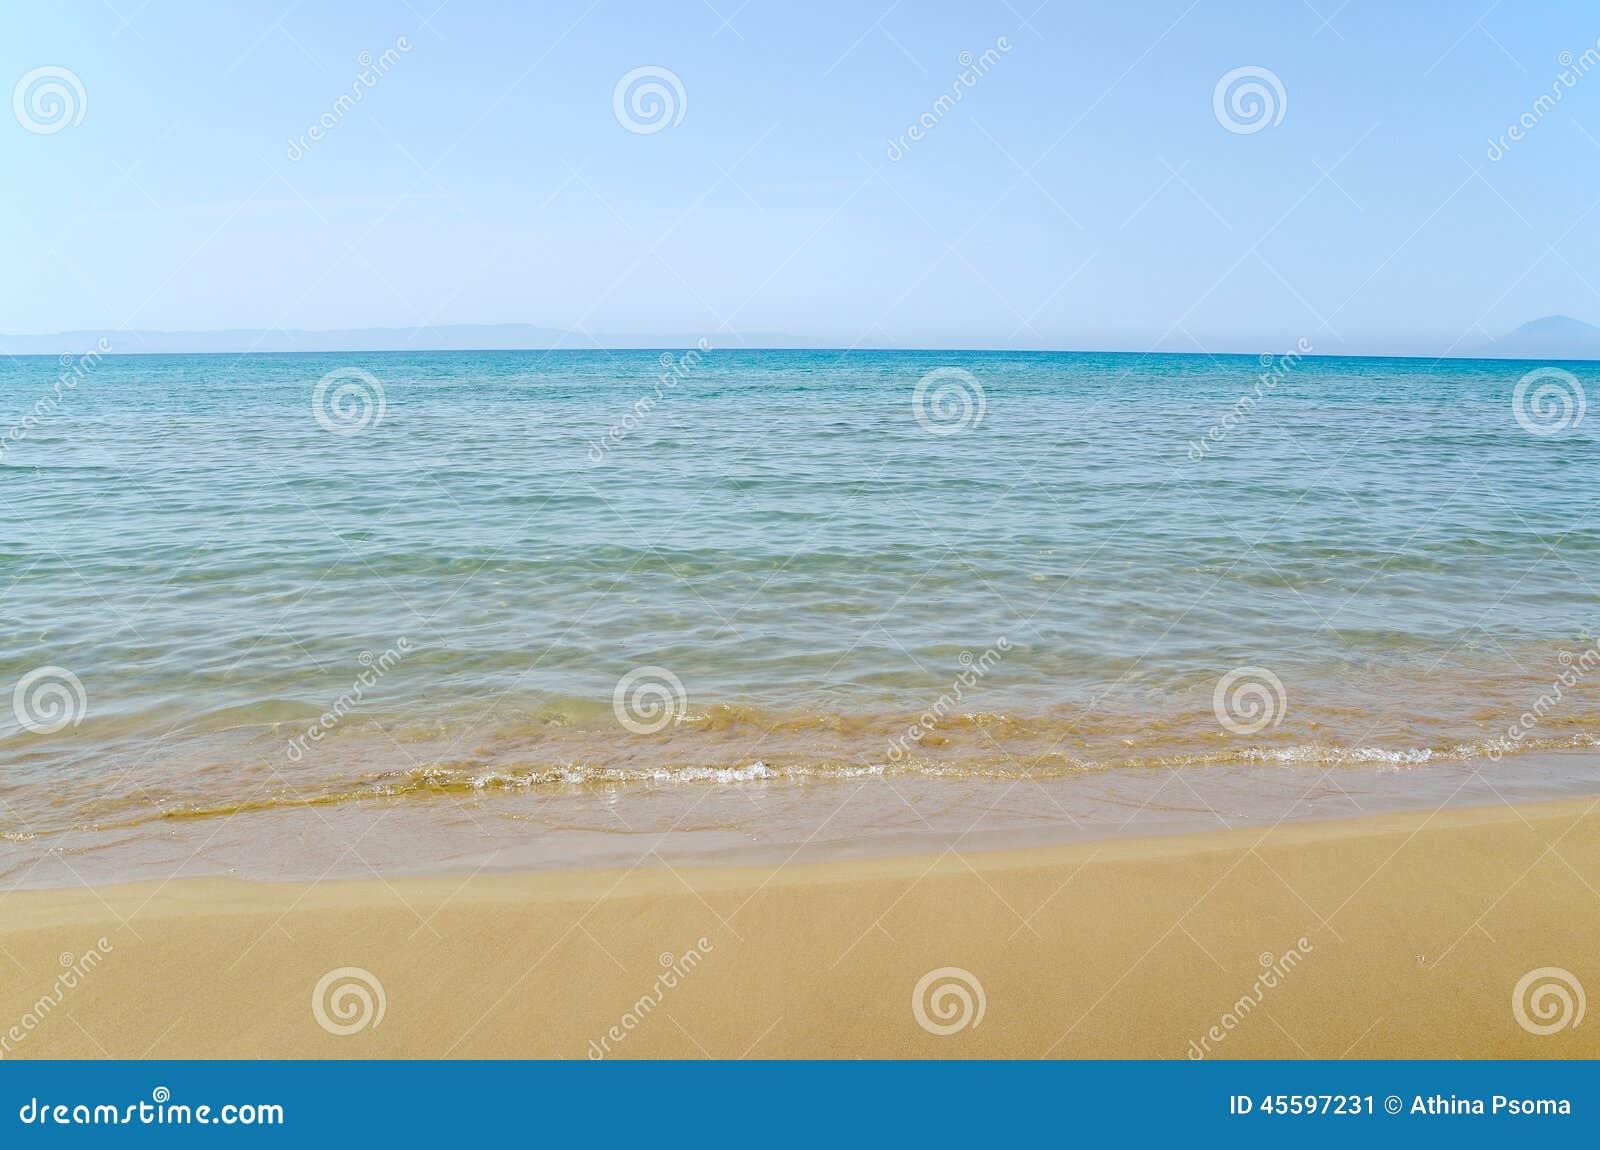 Sky, sea and sand